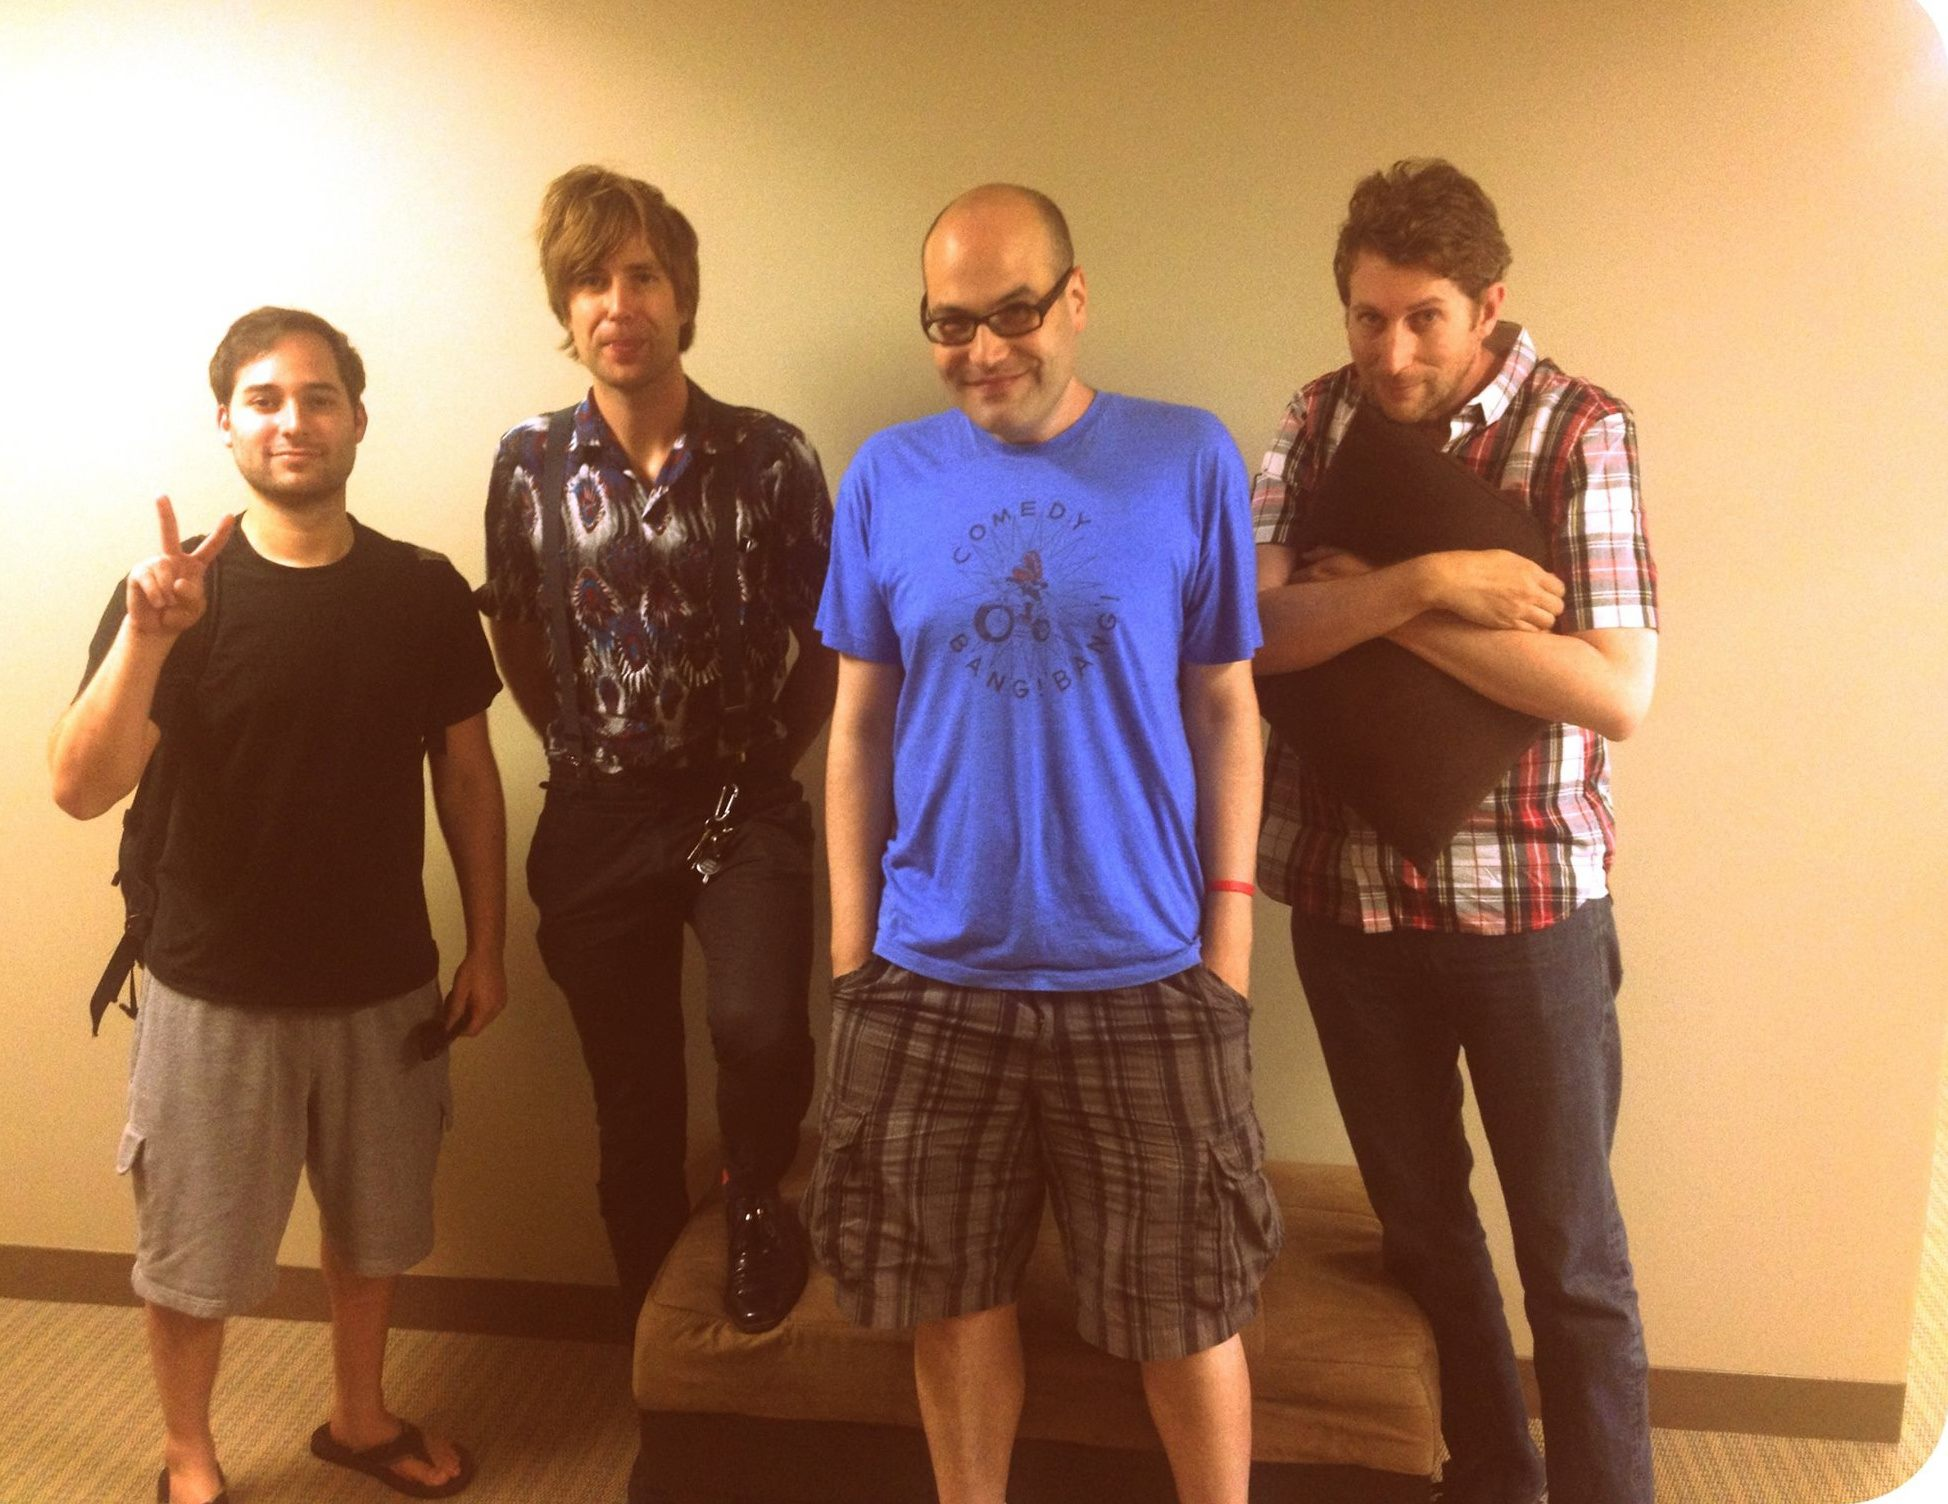 Harris, the dude from Islands, some podcast nerd, Scott Aukerman